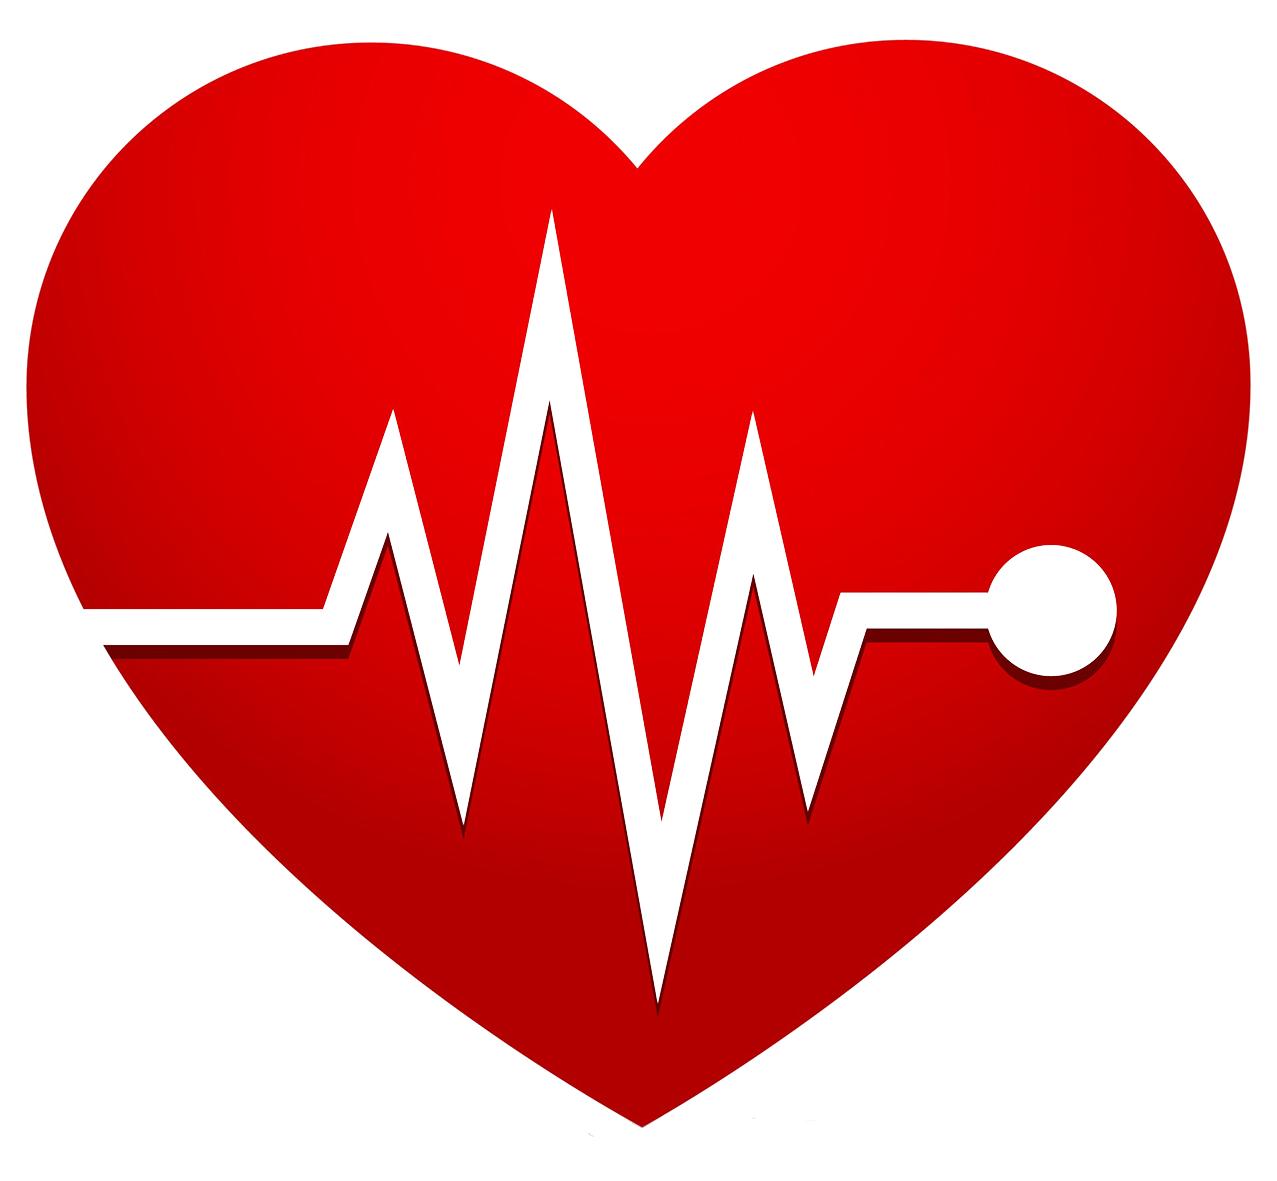 heart rate EKG red heart